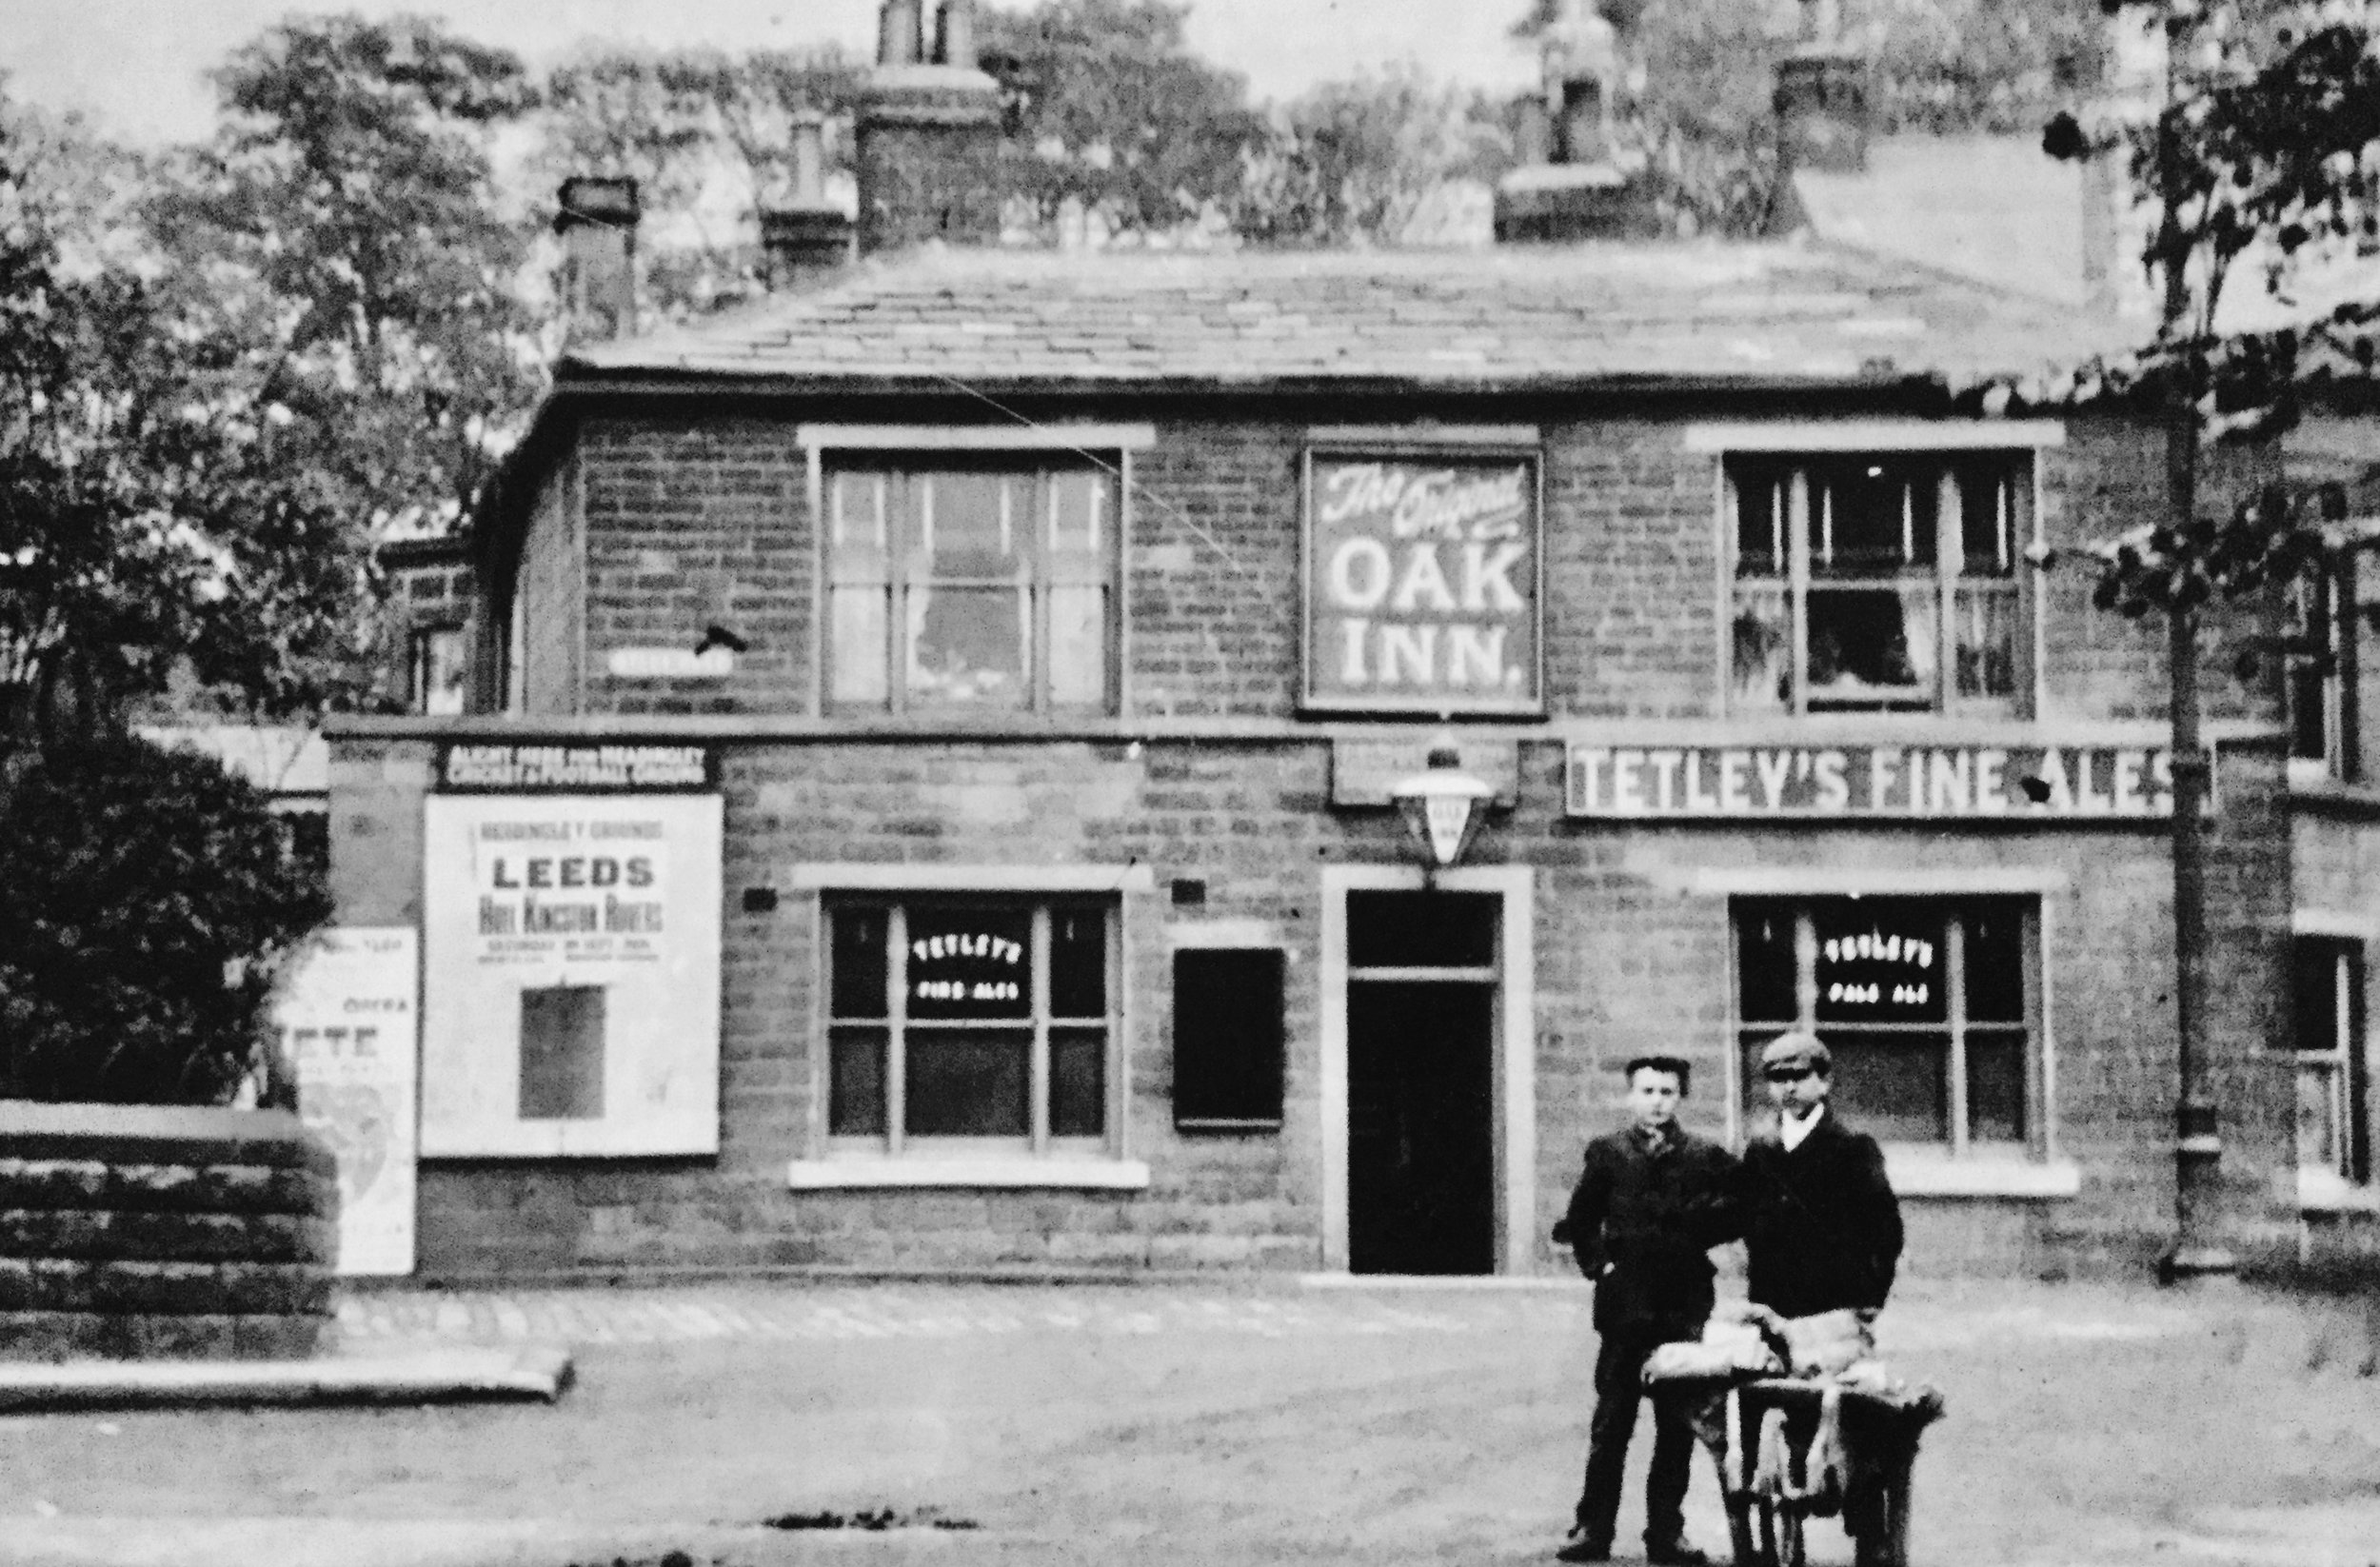 Original Oak Inn, circa 1900